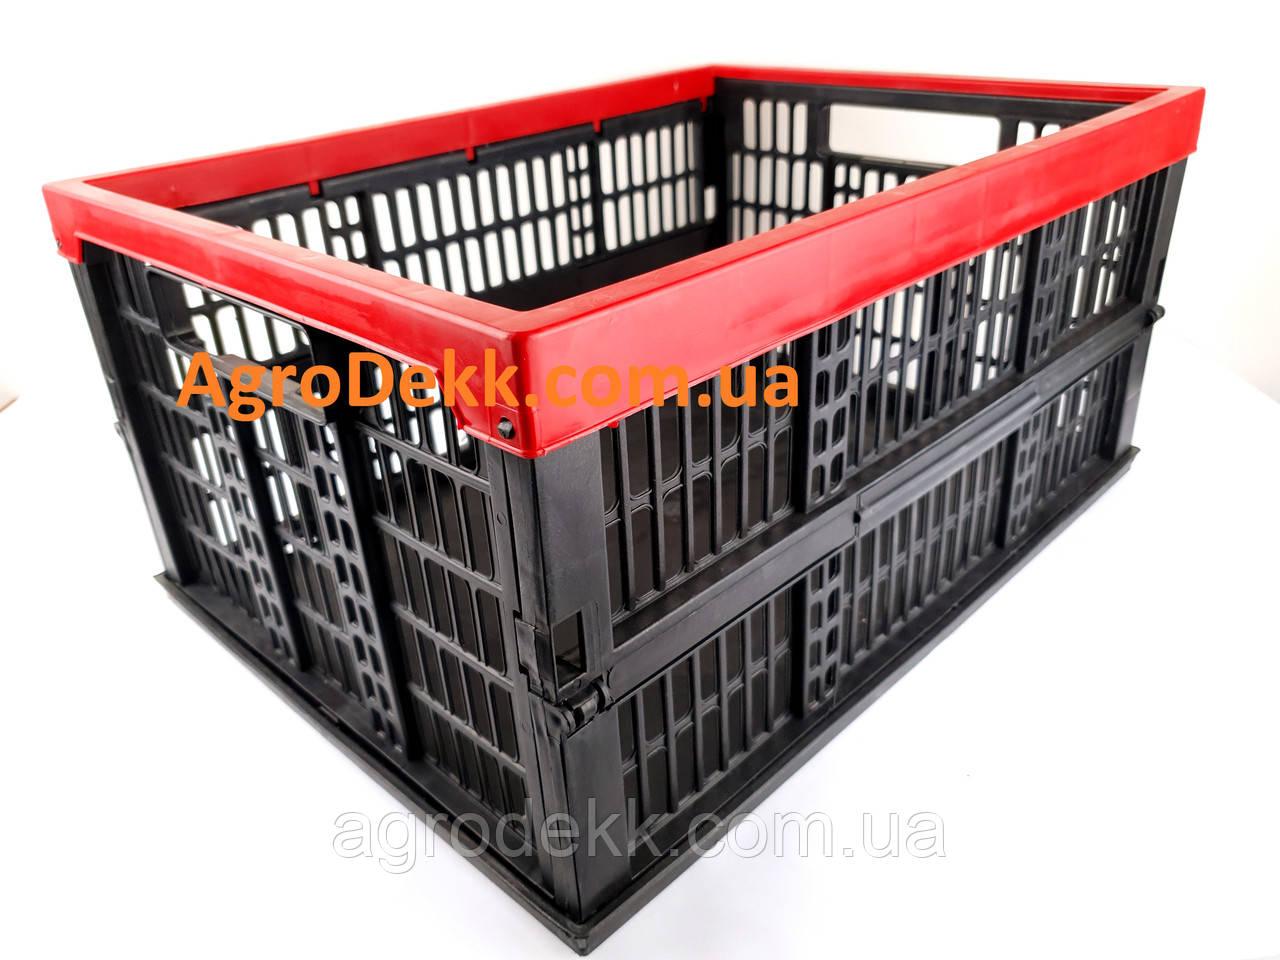 Ящик пластиковый складной 480х350х240/60мм